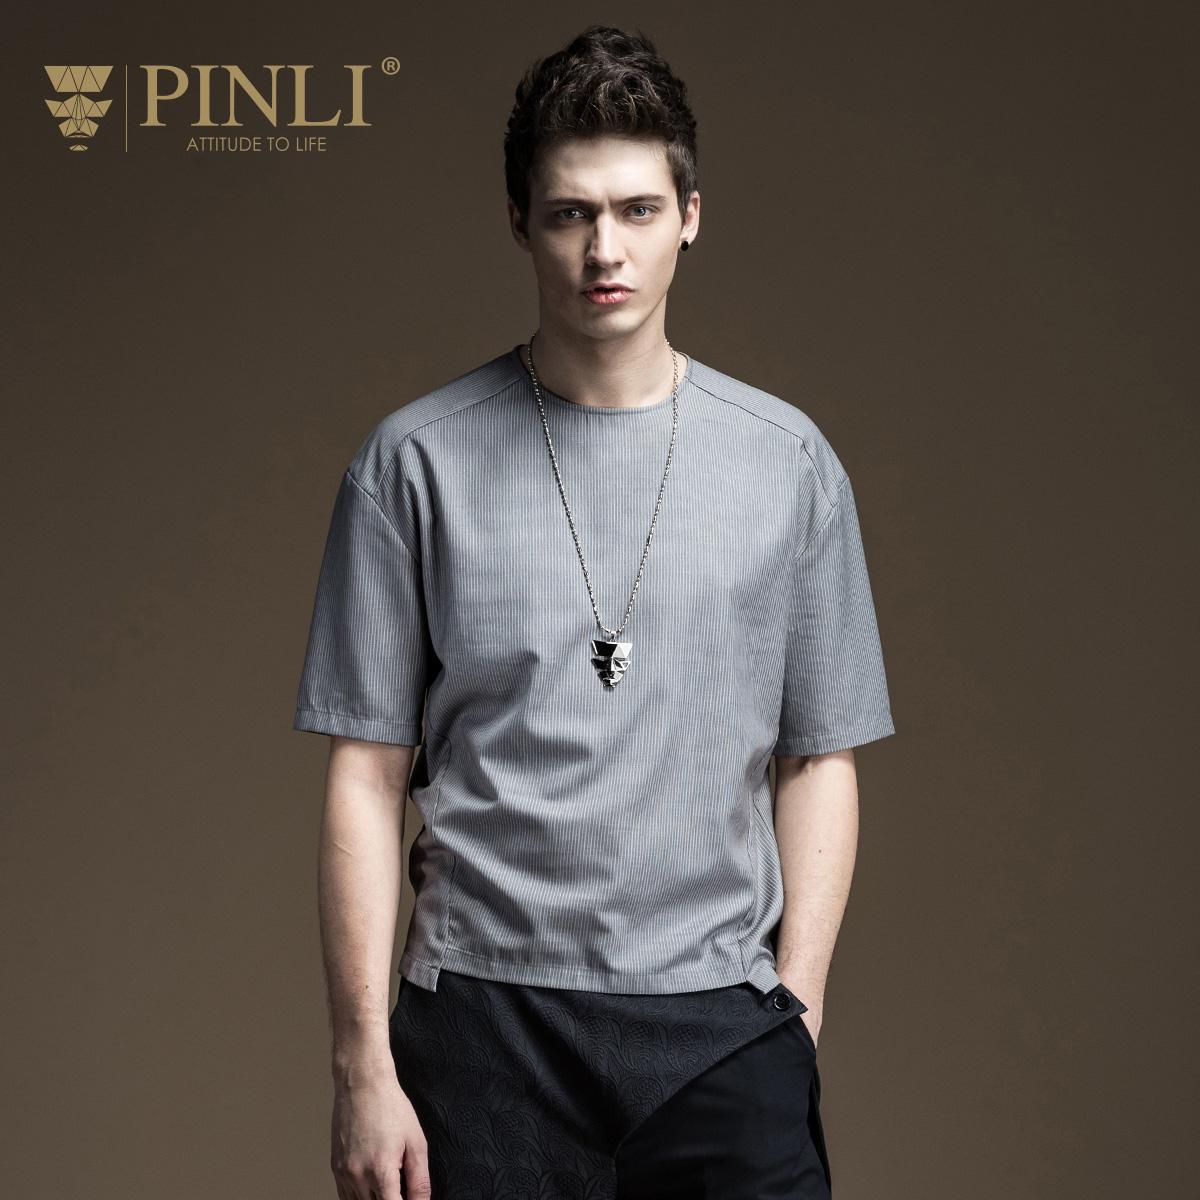 PINLI品立短袖t恤男 新款修身半袖上衣纯色潮牌衣服B172211099